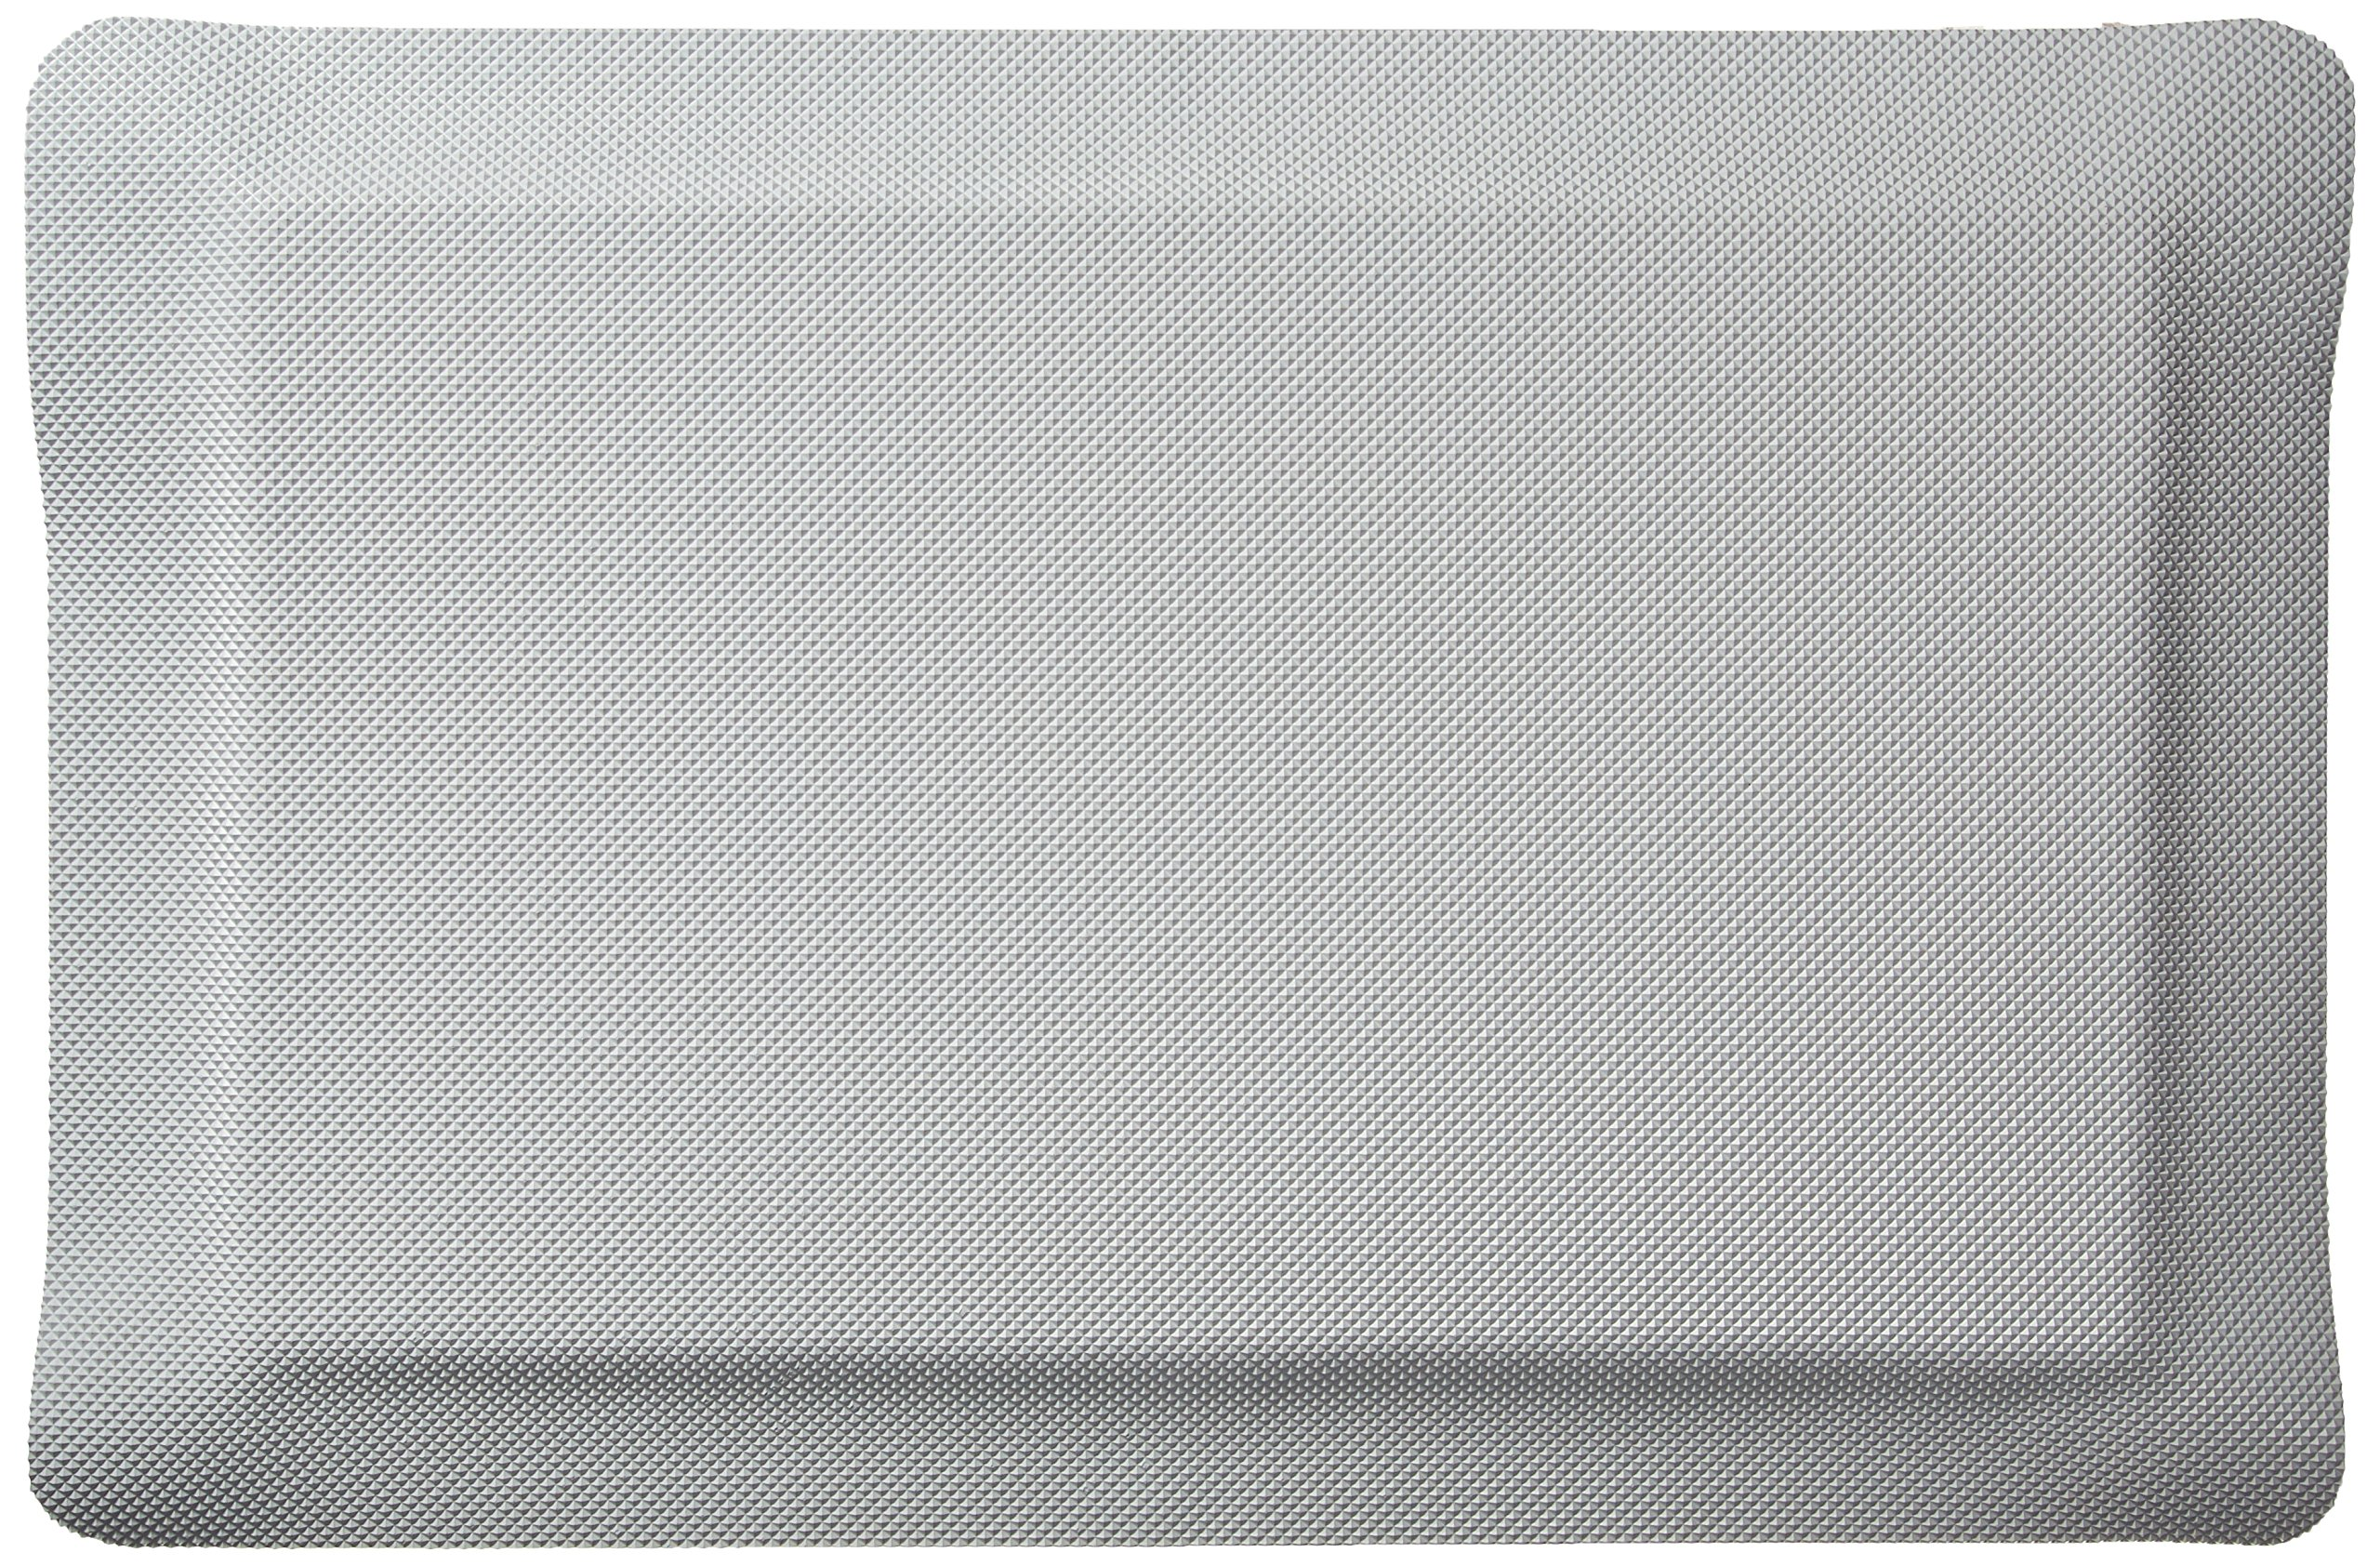 Rhino Mats PMA-2436DSW Pyra-Mat Anti Fatigue Mat, 2' Width x 3' Length x 7/8'' Thickness, White